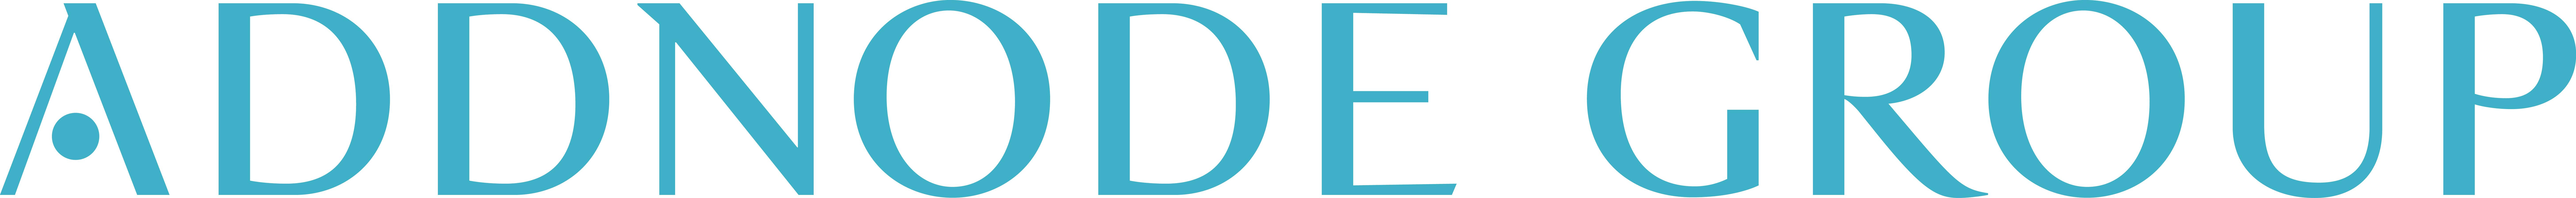 addnode logo